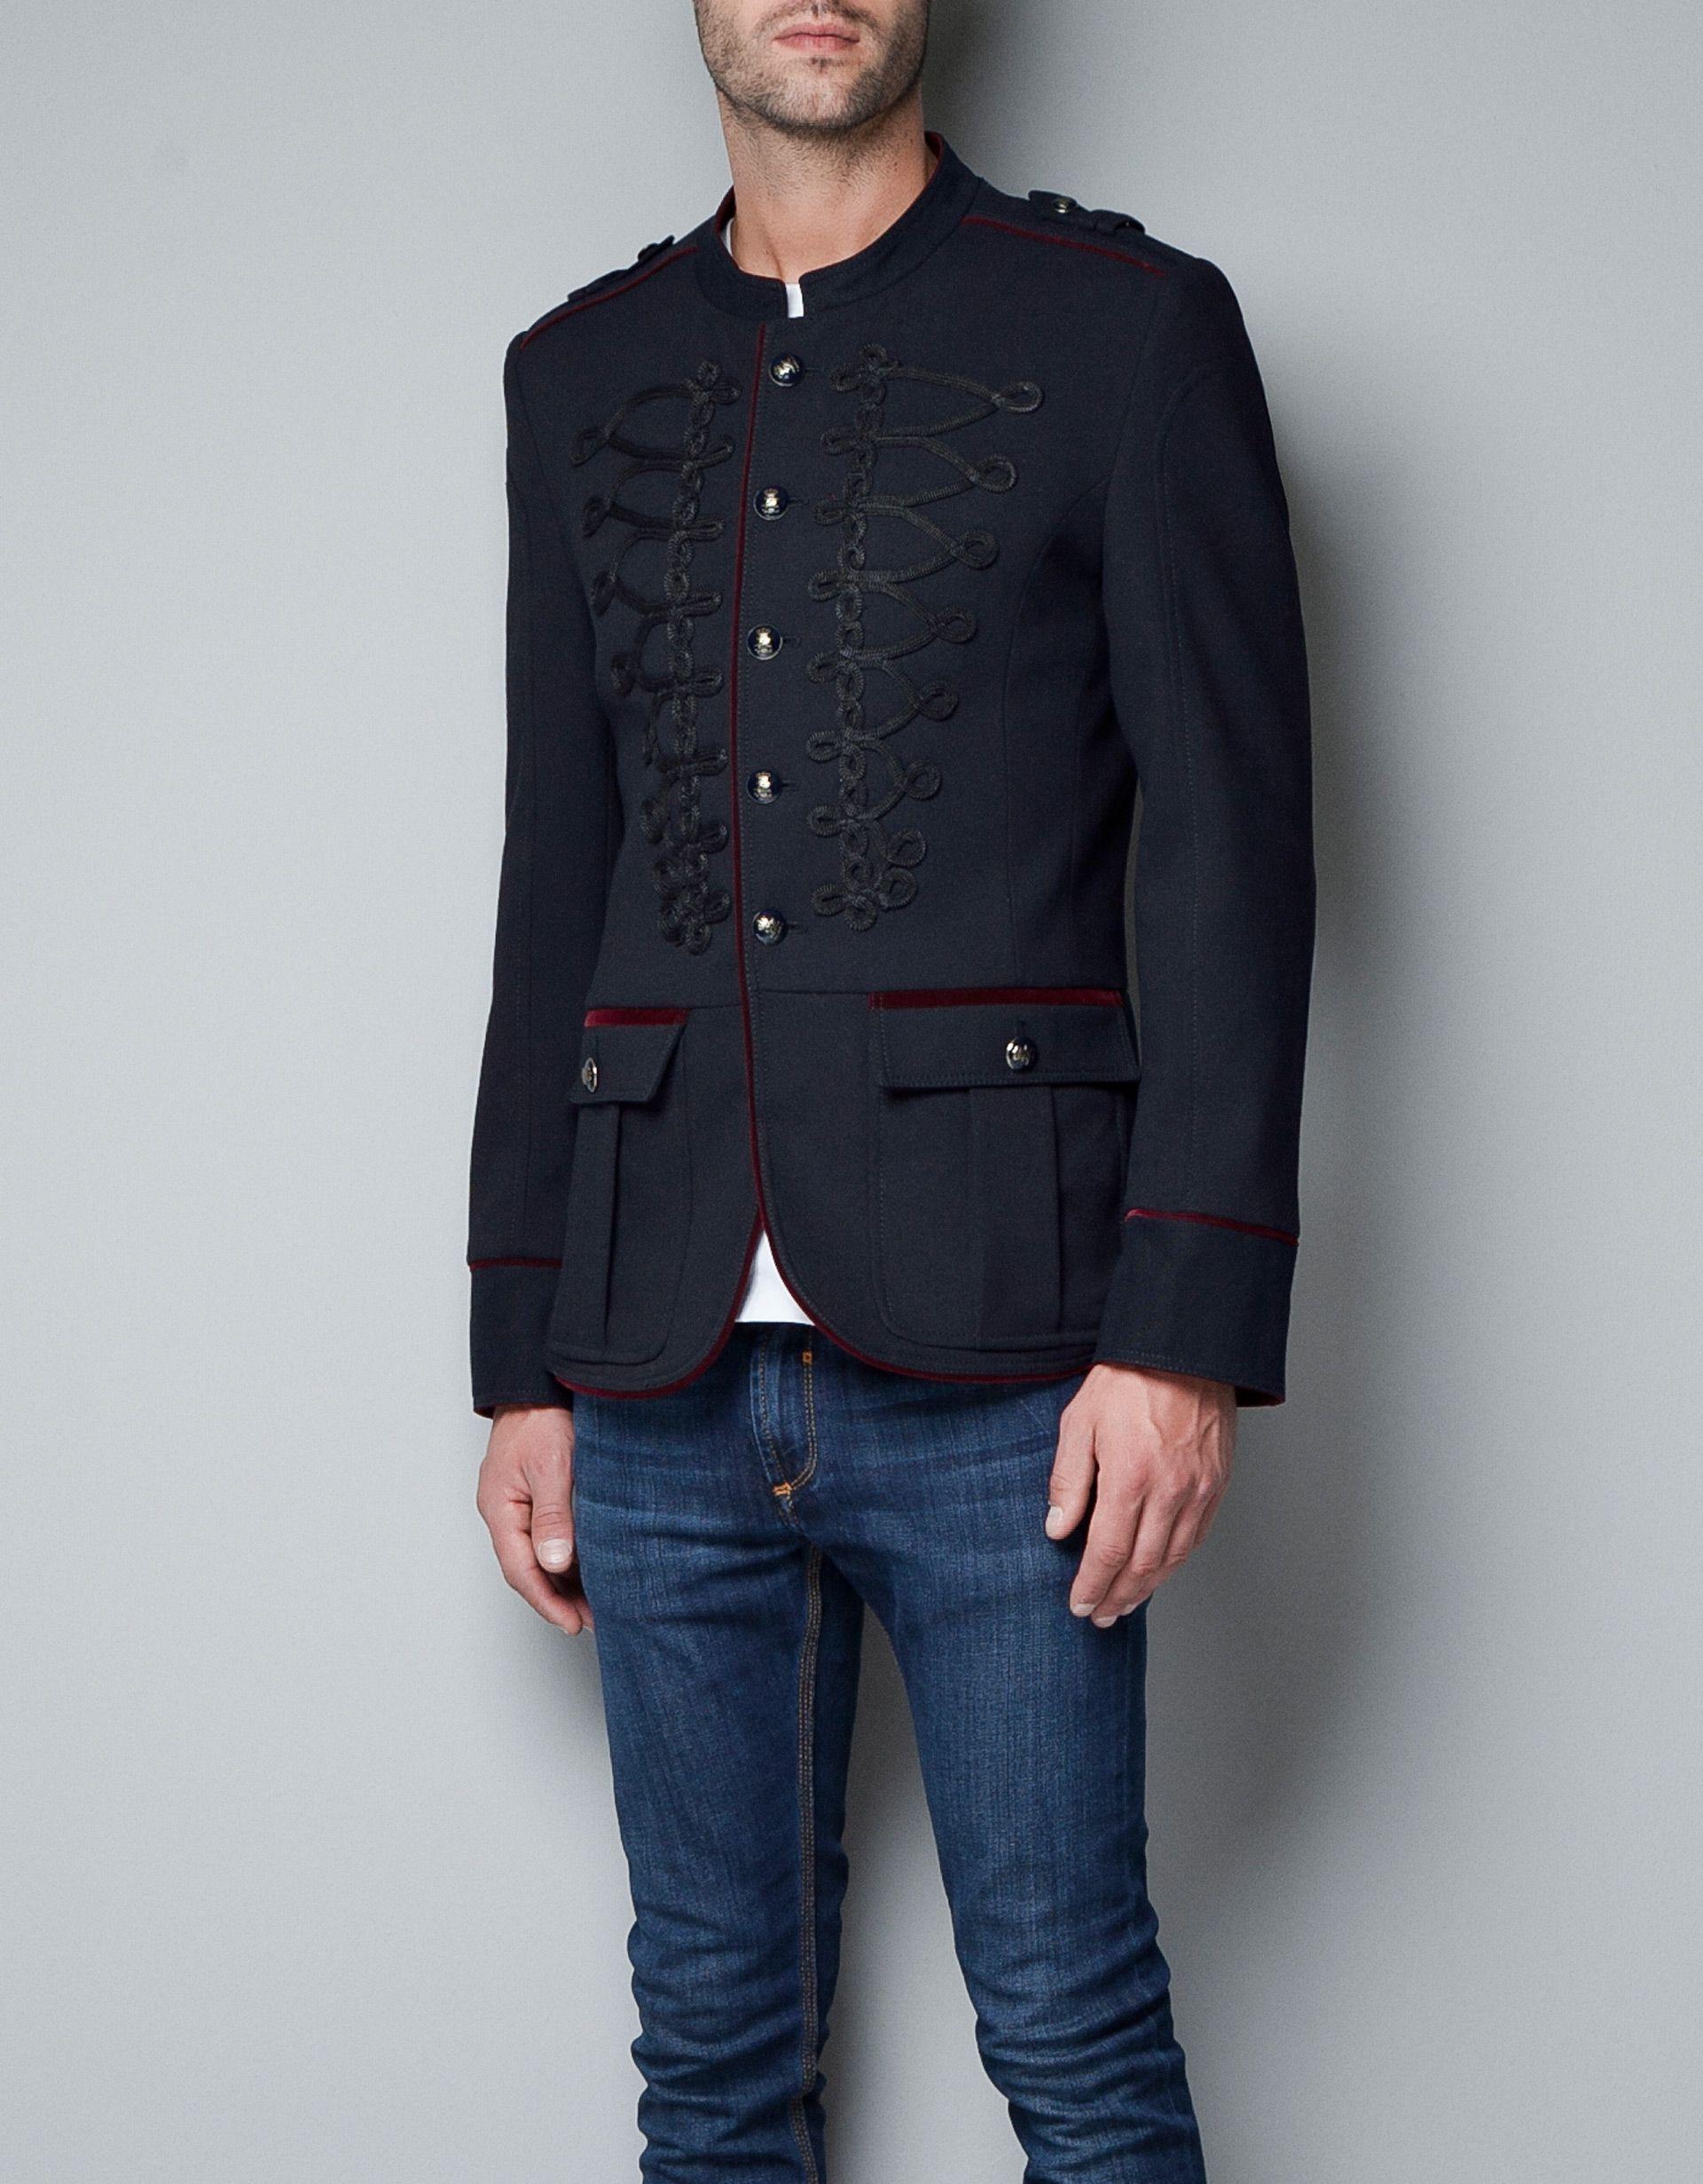 giacca militare alamari blazer uomo zara italia. Black Bedroom Furniture Sets. Home Design Ideas